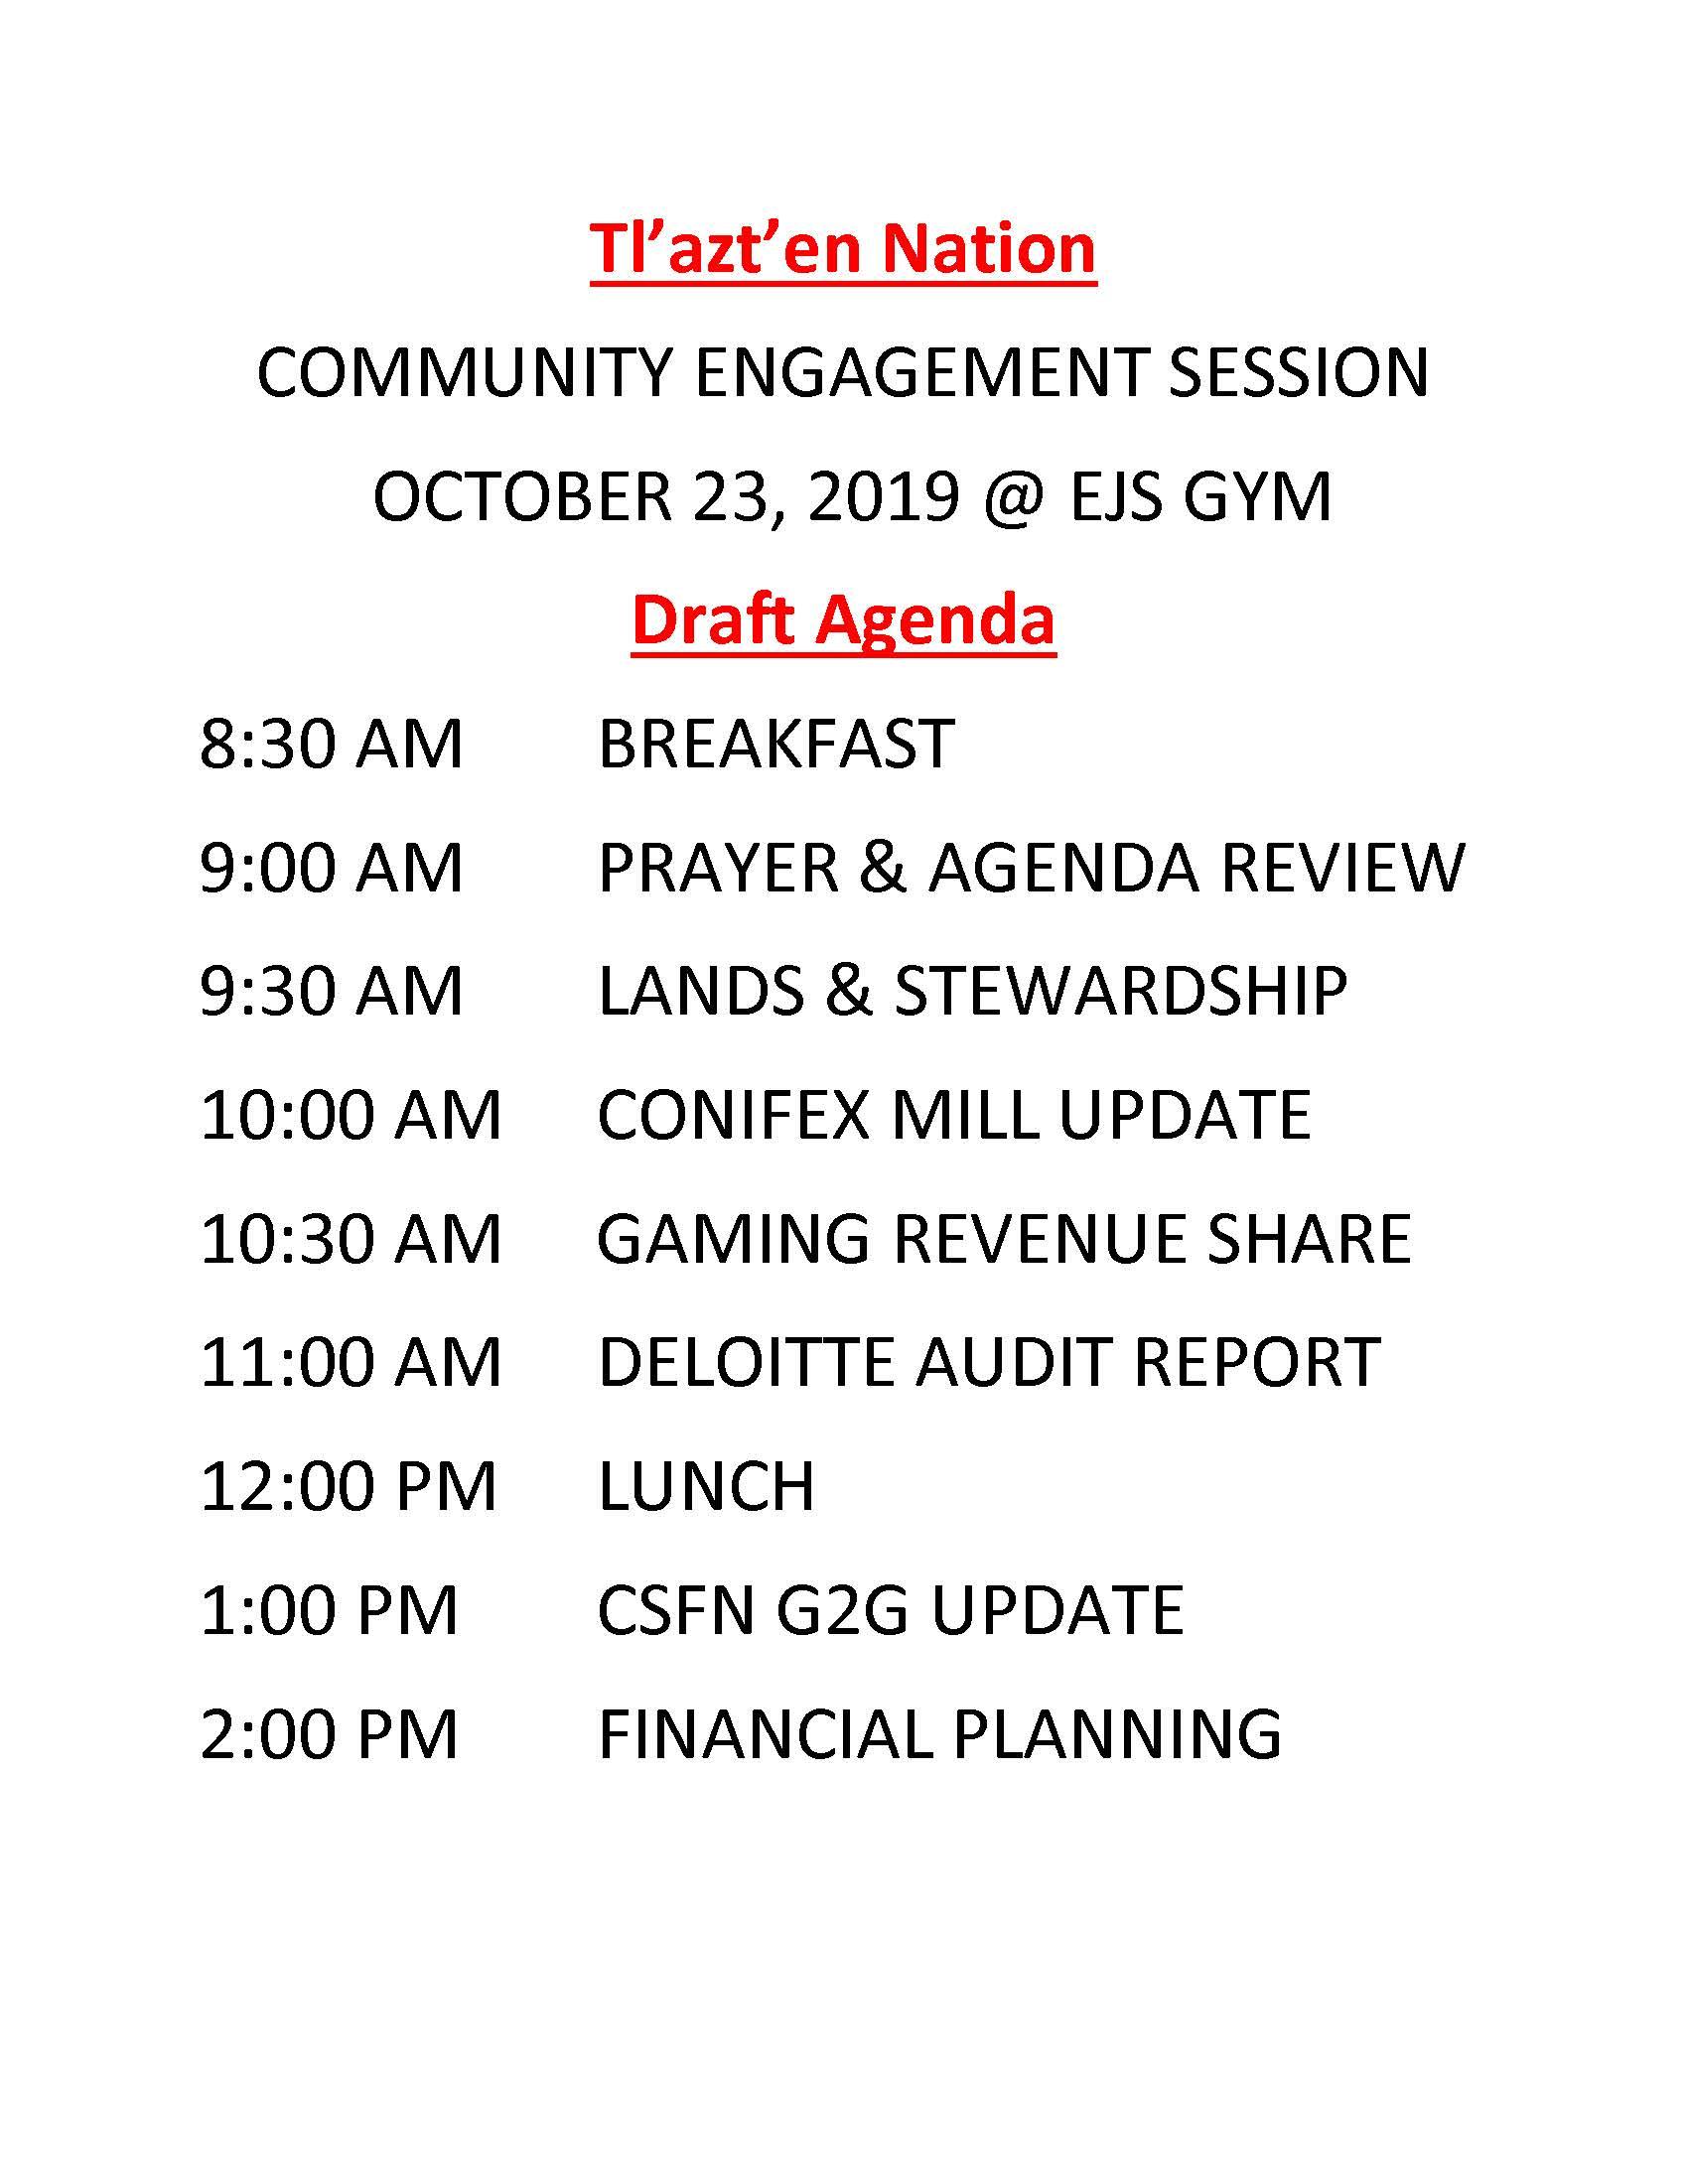 Community Engagement October 23, 2019